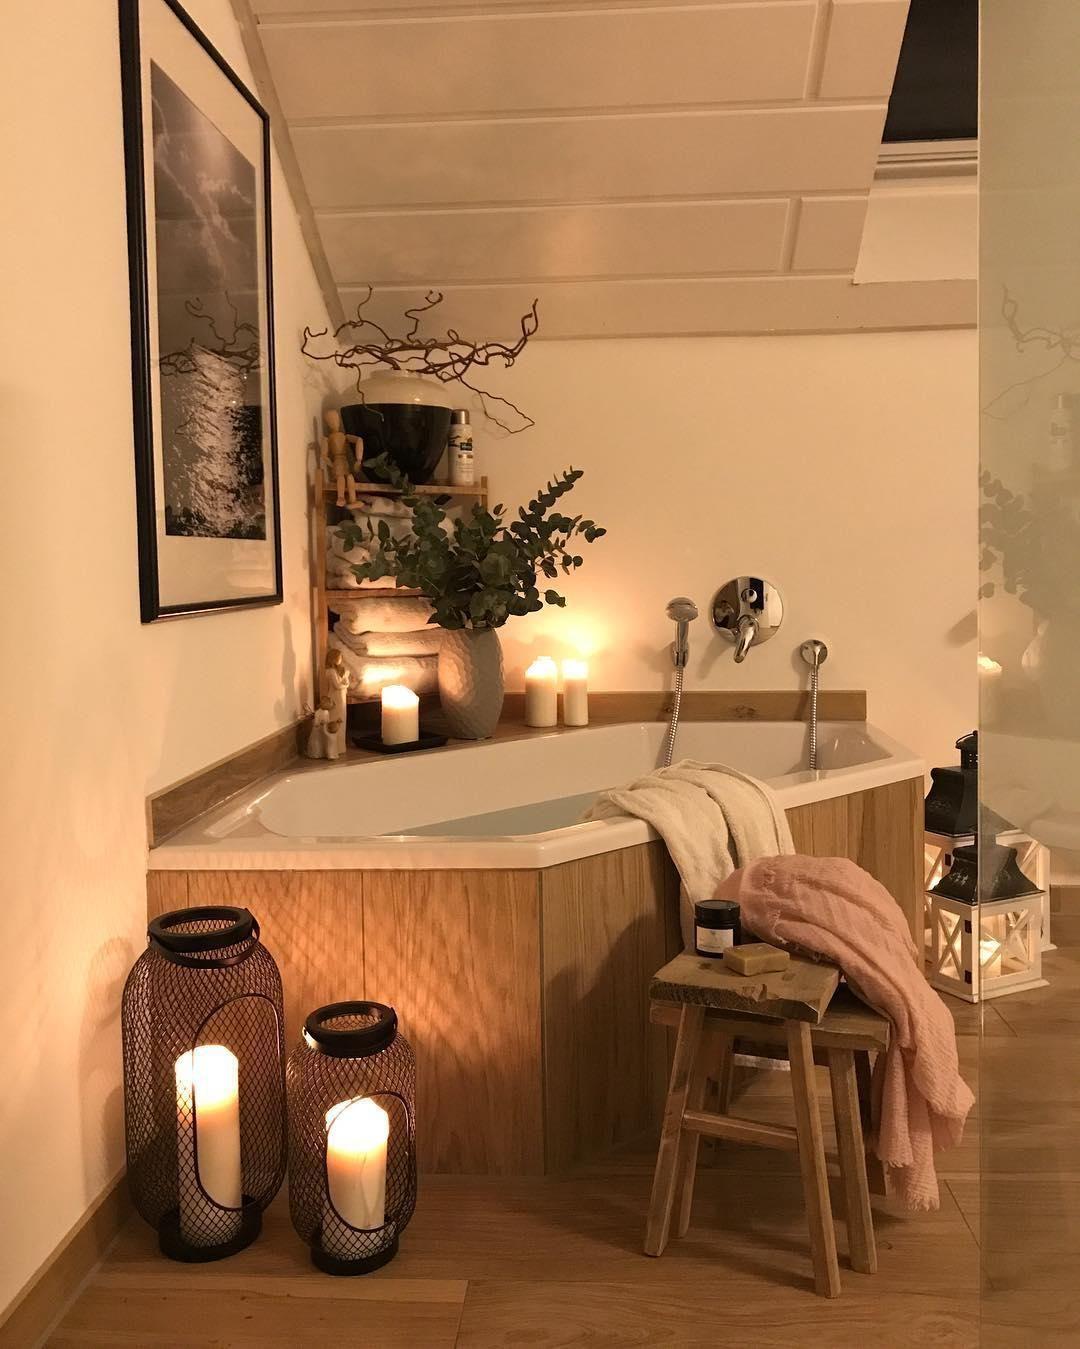 Hottest Photo Rustic Bathroom Bathtub Style Some Sort Of